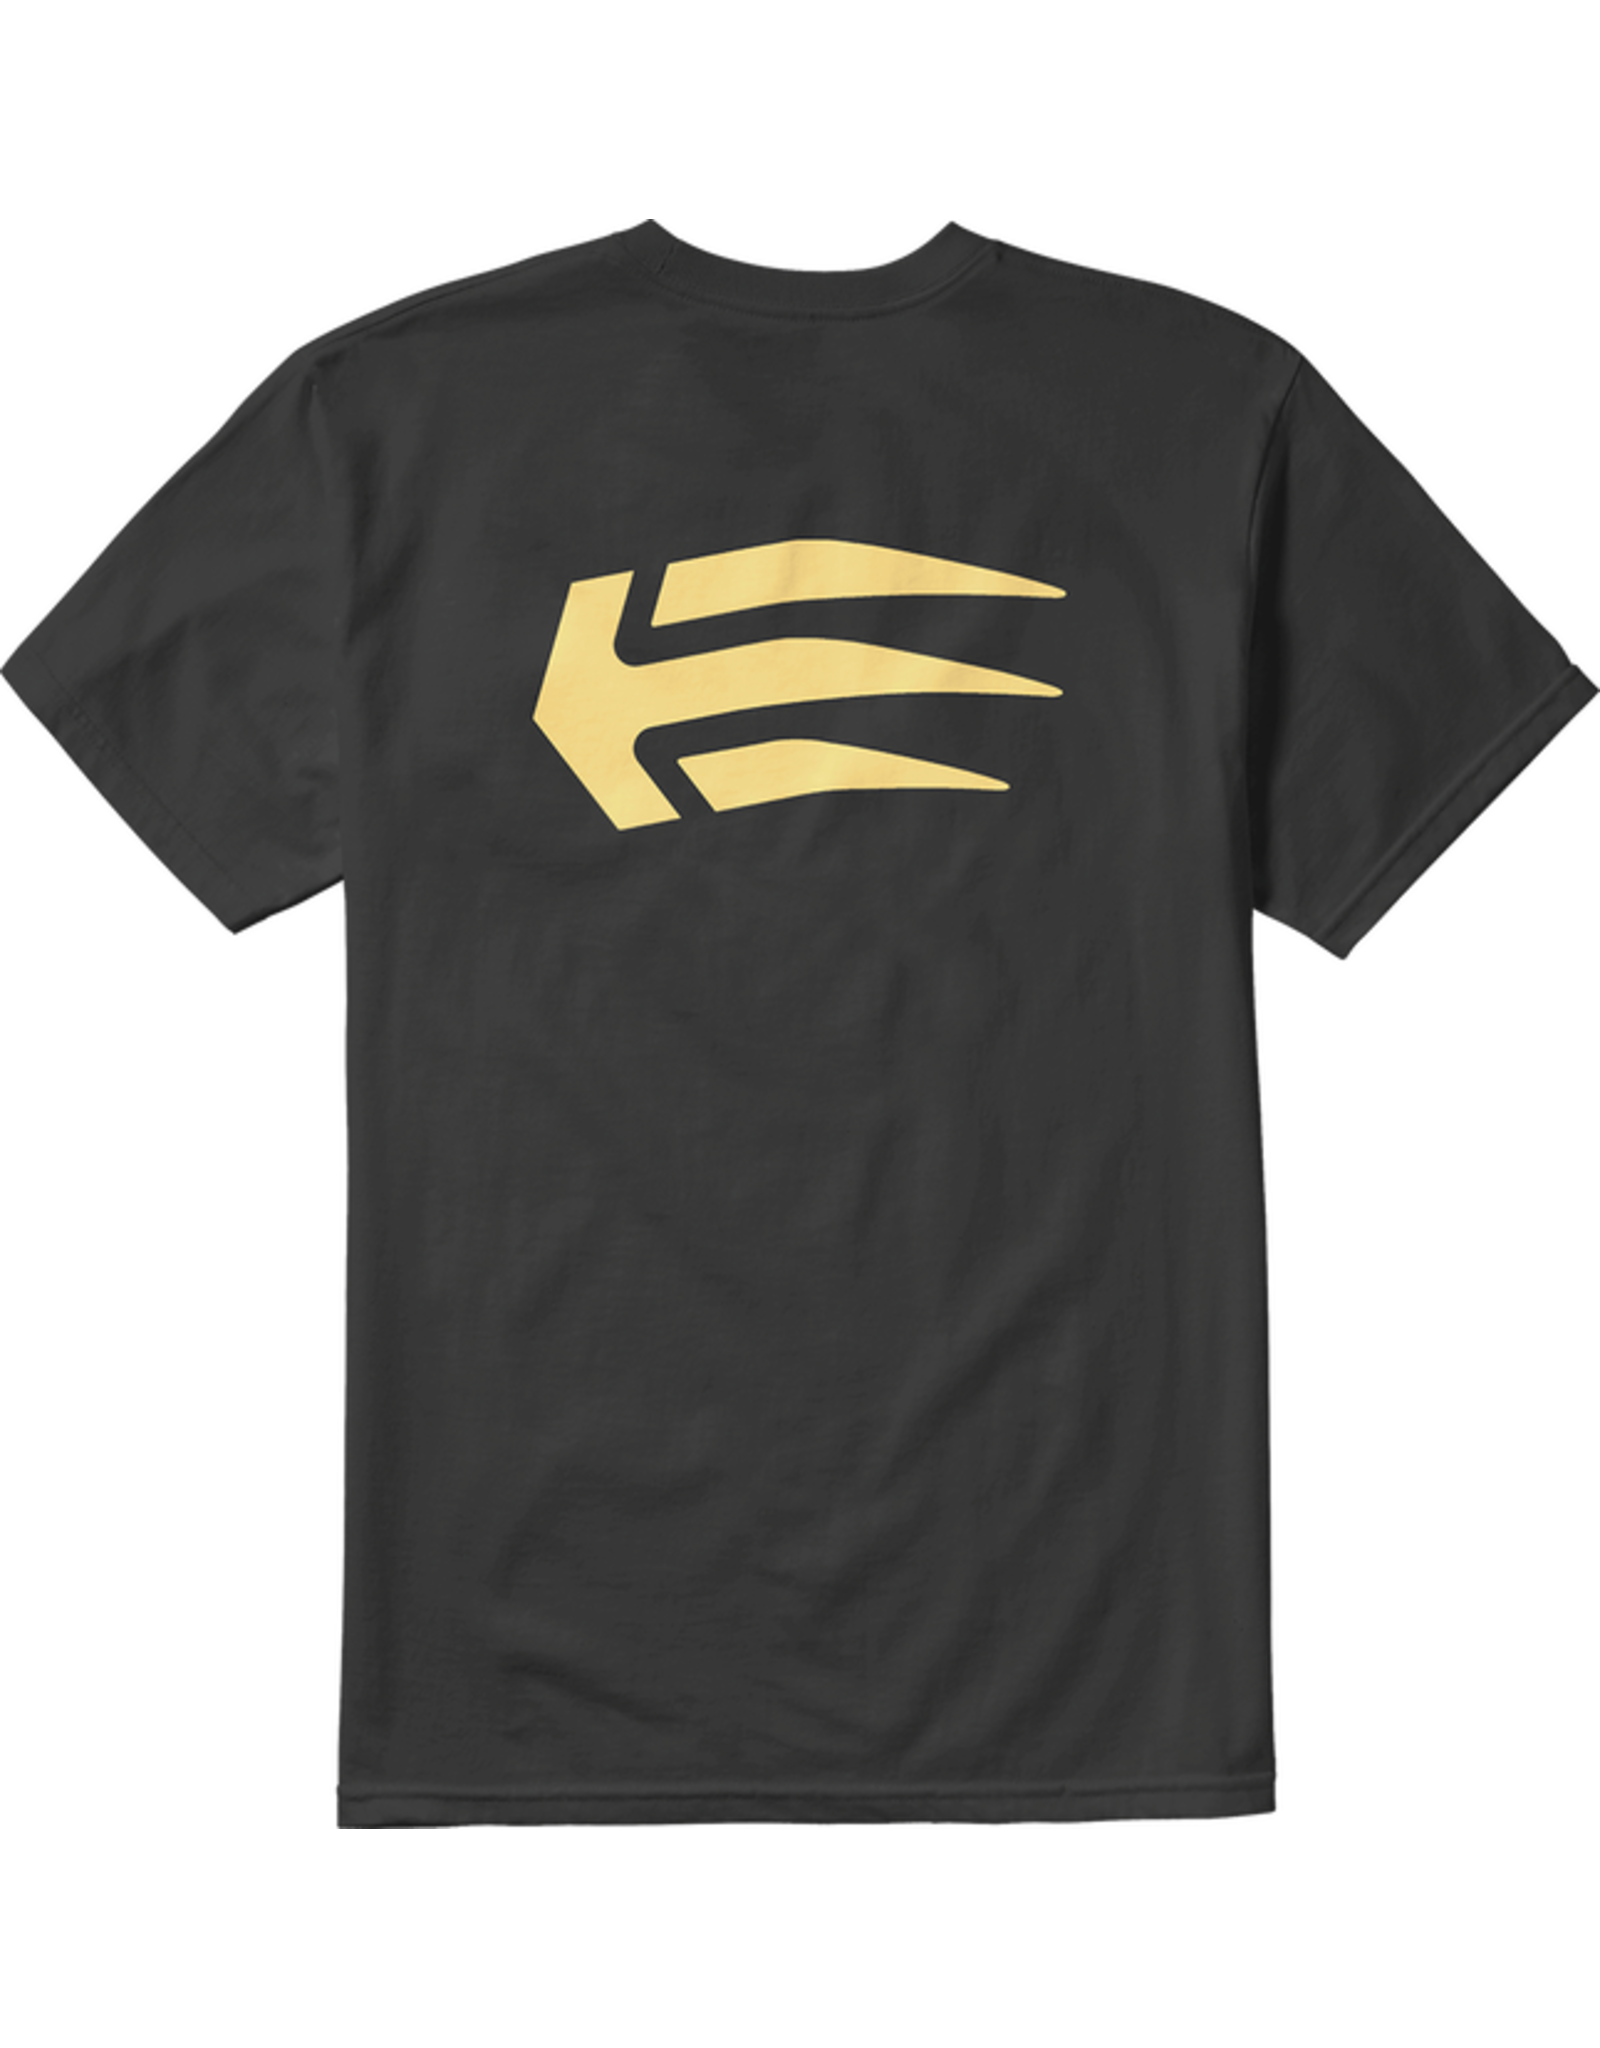 etnies Etnies - T-shirt homme Joslin black/gold